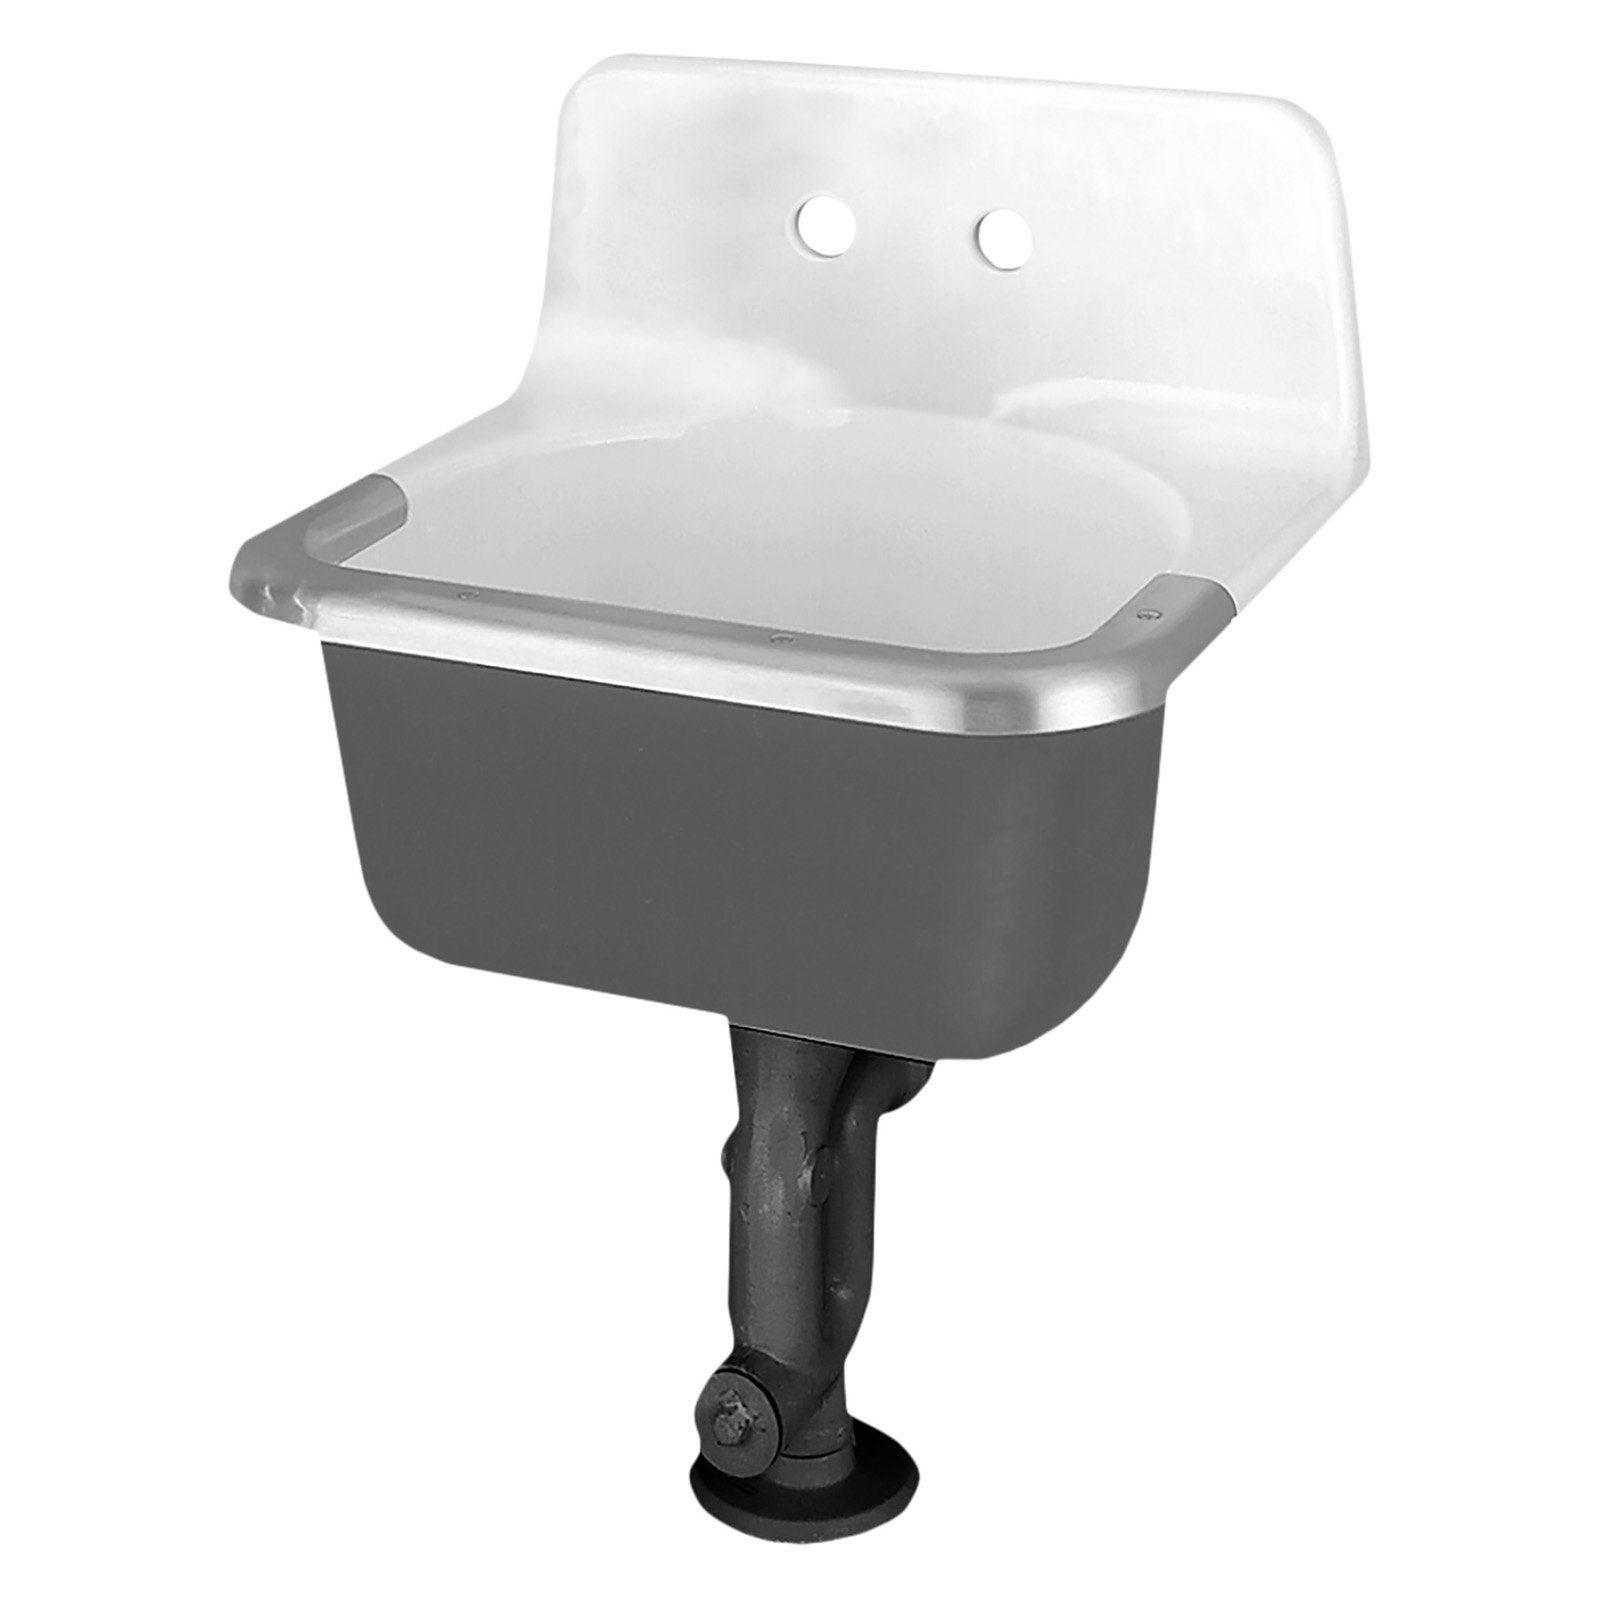 American Standard Akron 7695 008 020 Wall Mount Bathroom Sink